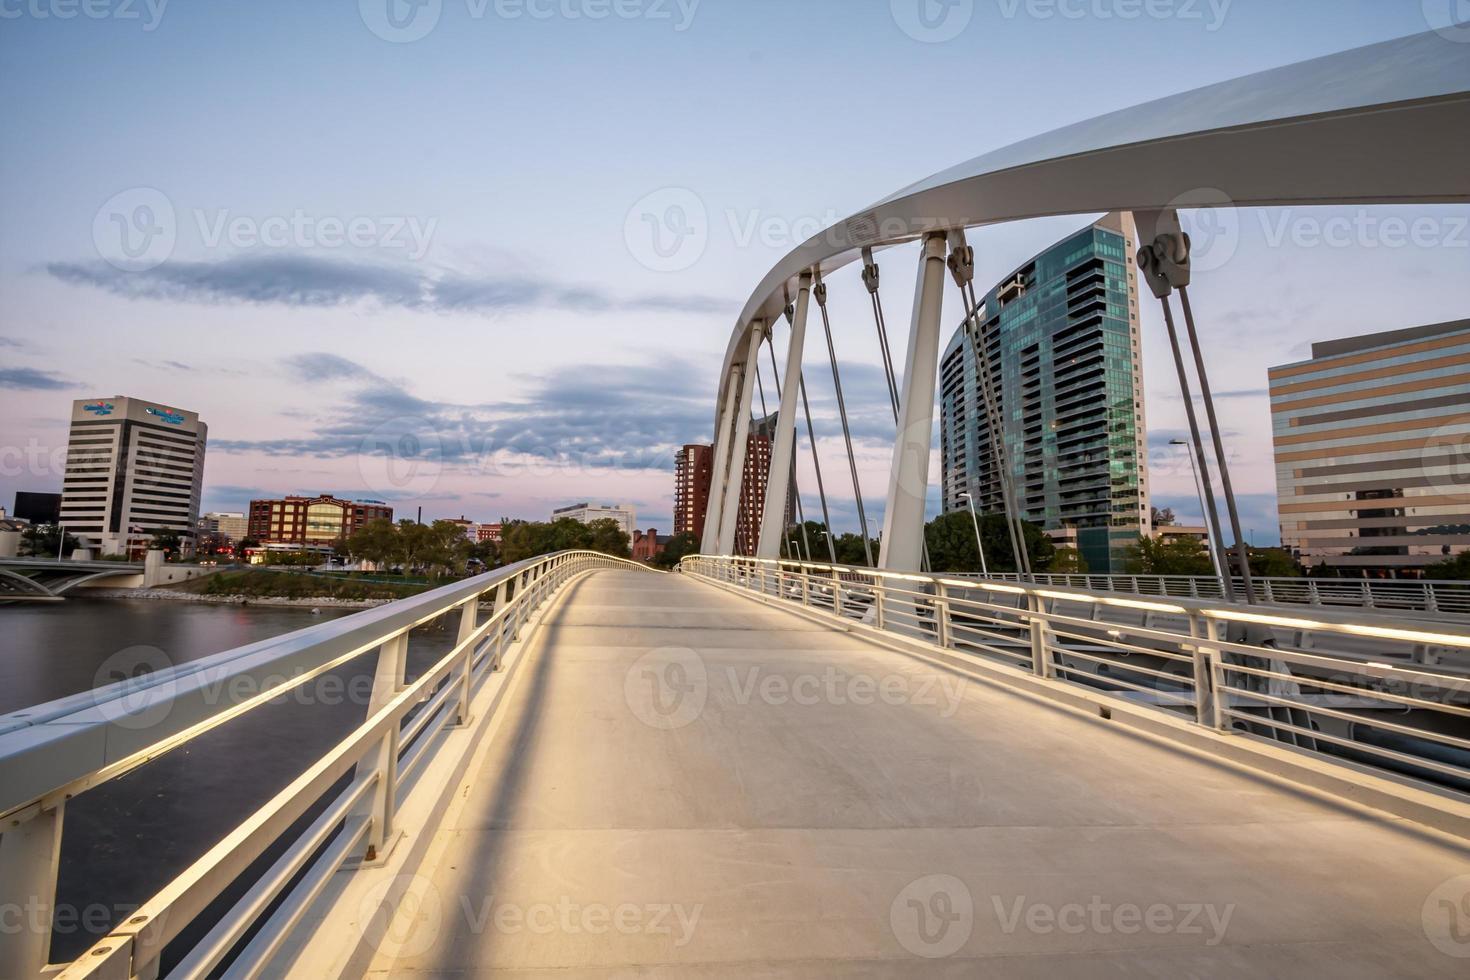 Hauptstraße Brücke Innenstadt Columbus Ohio Stadtbild Scioto River HDR foto